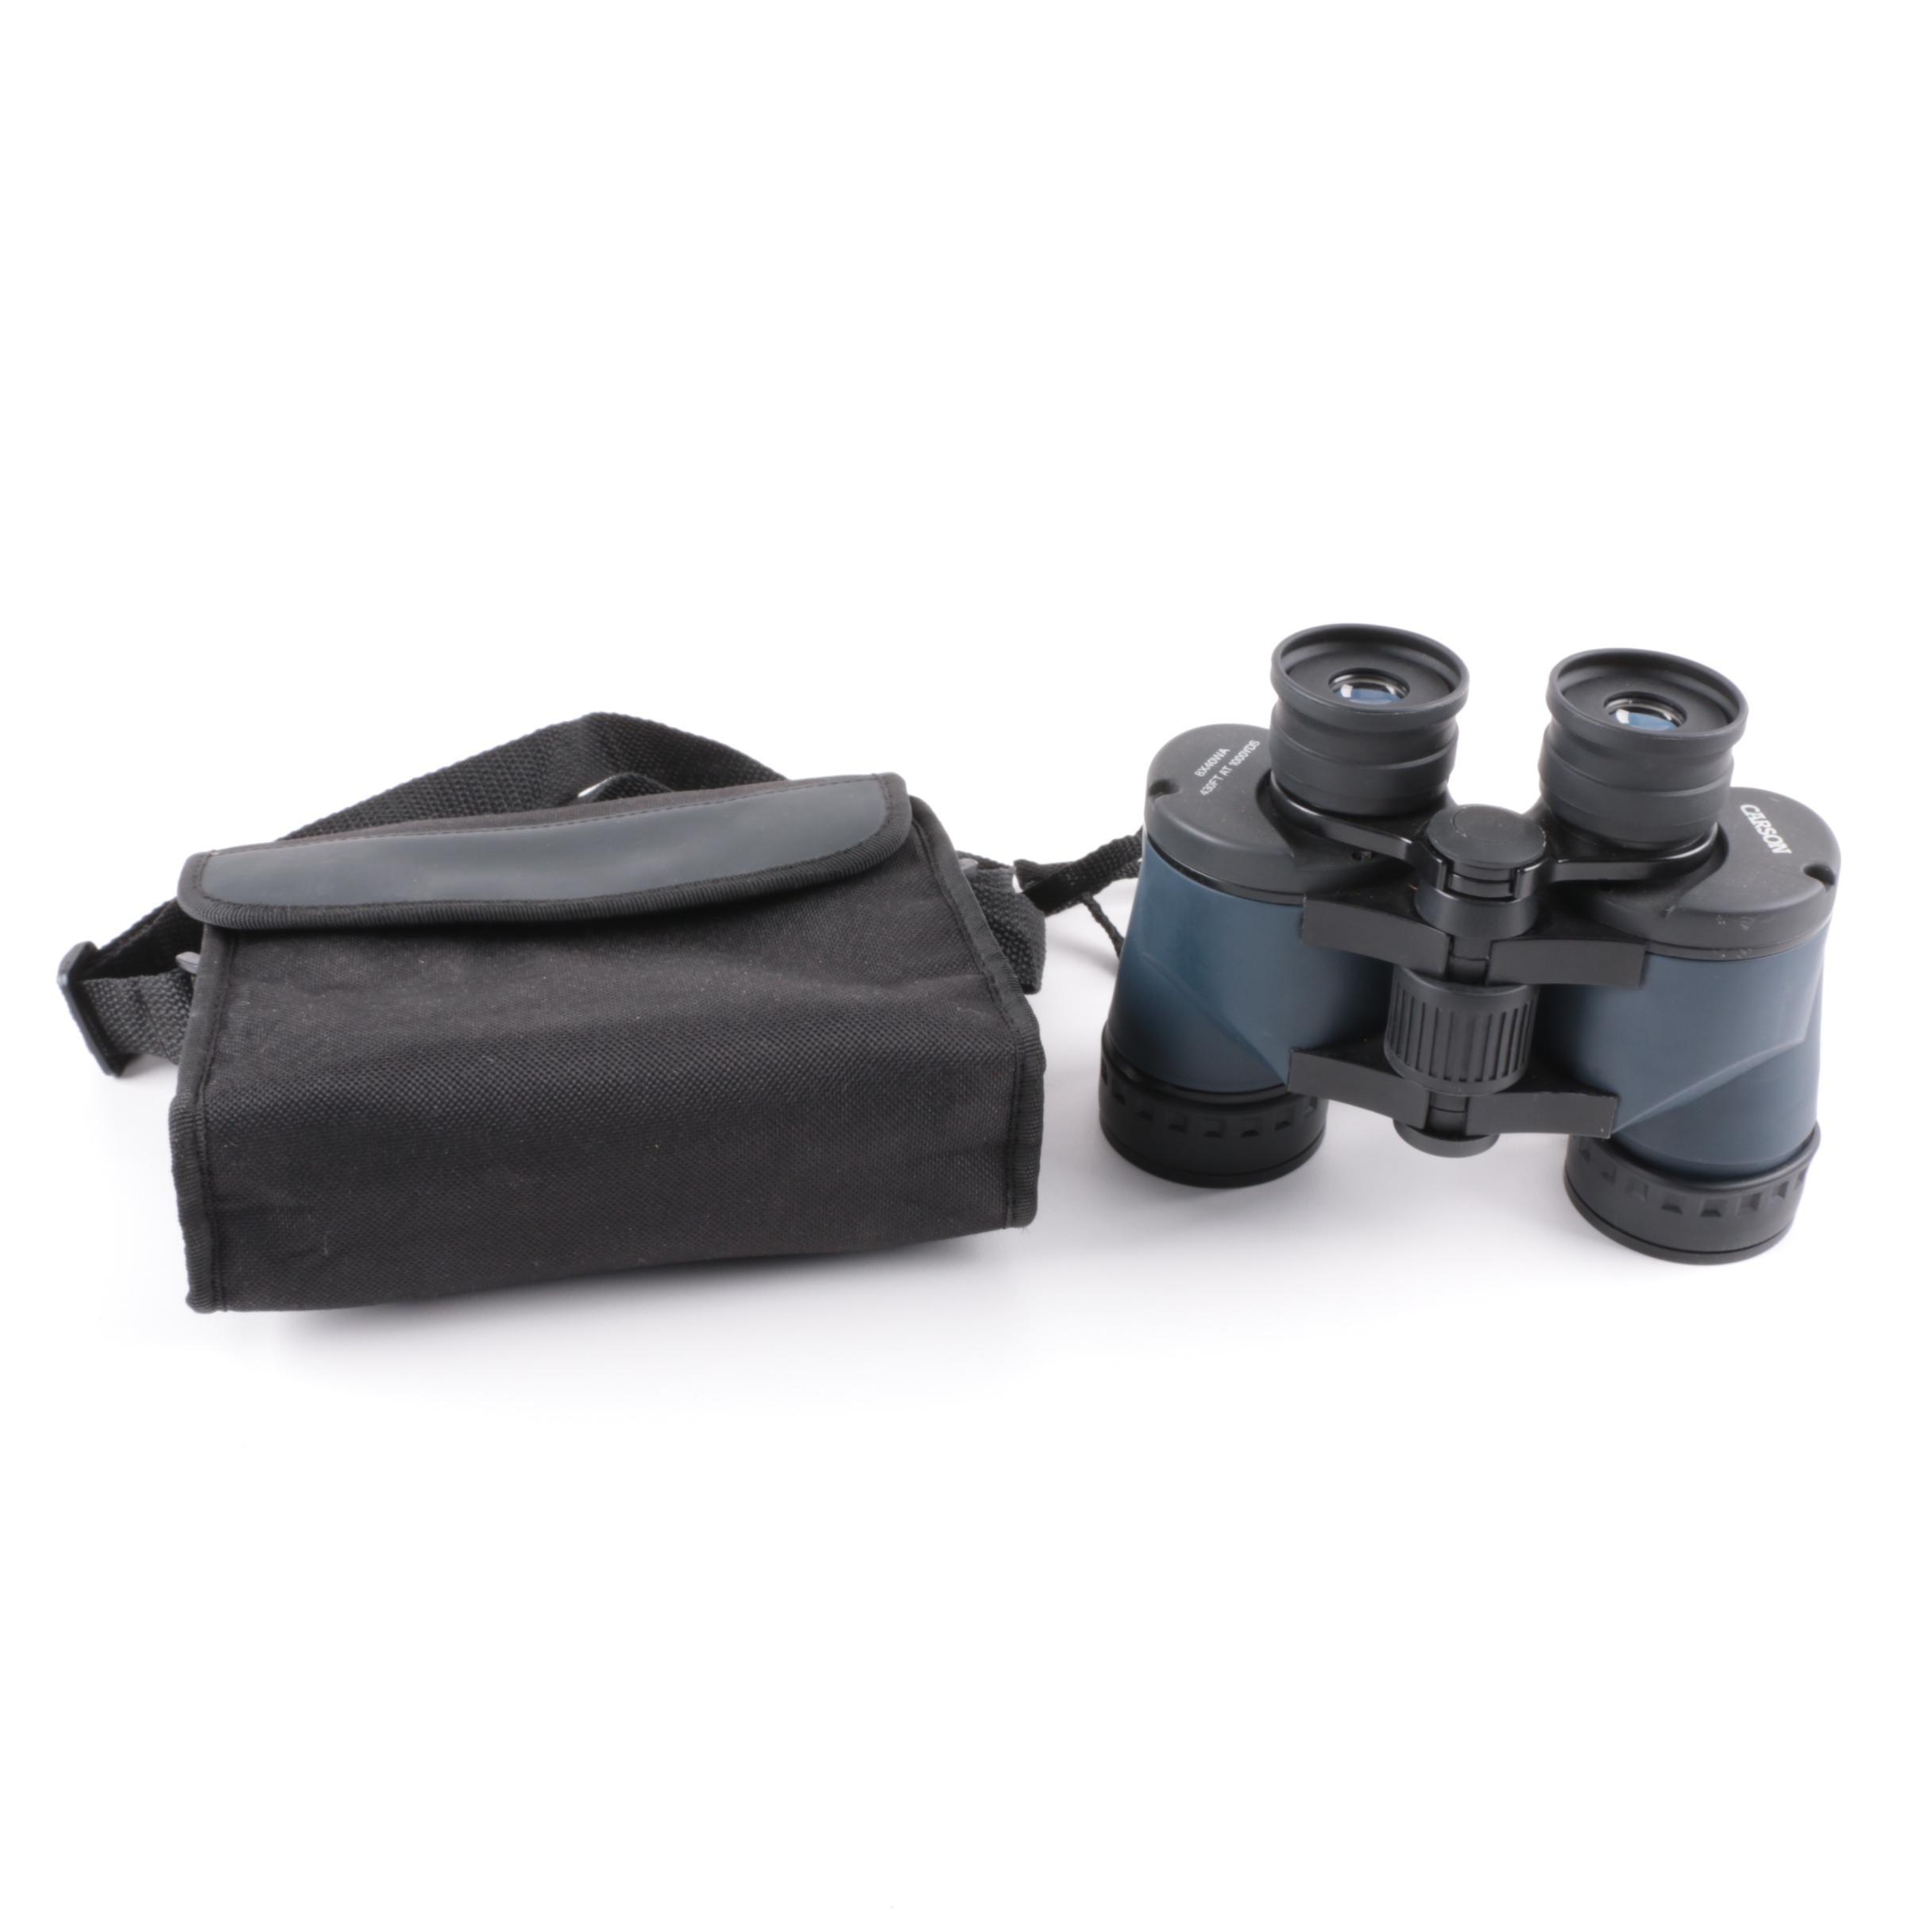 Carson 8x40 Wide Angle Binoculars with Case